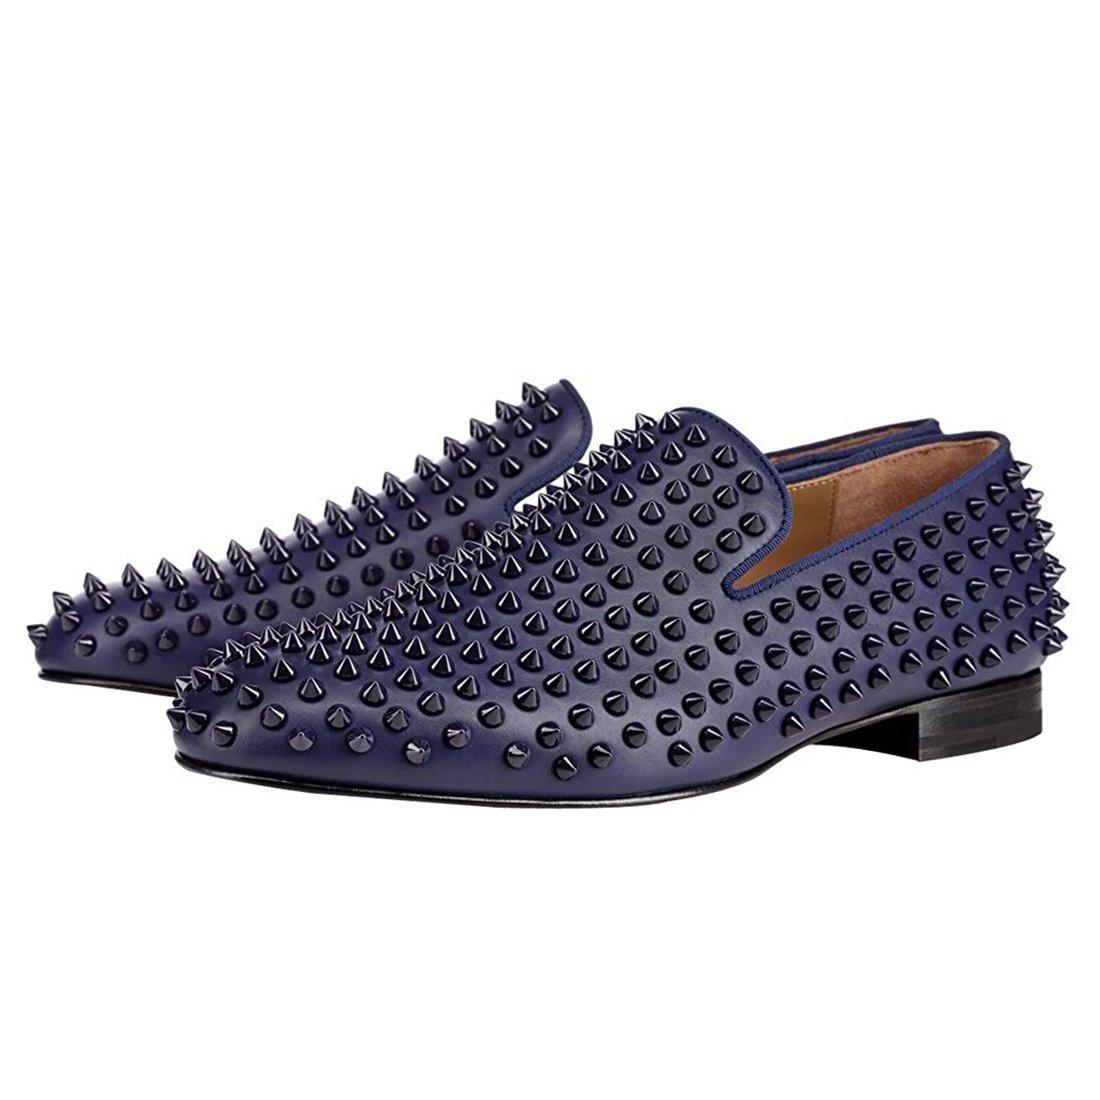 Cuckoo Cuckoo Cuckoo Rivets Hommes Slip on Mocassins Oxford Noir Dress Chaussures B075T3T53T Chaussons d9e600